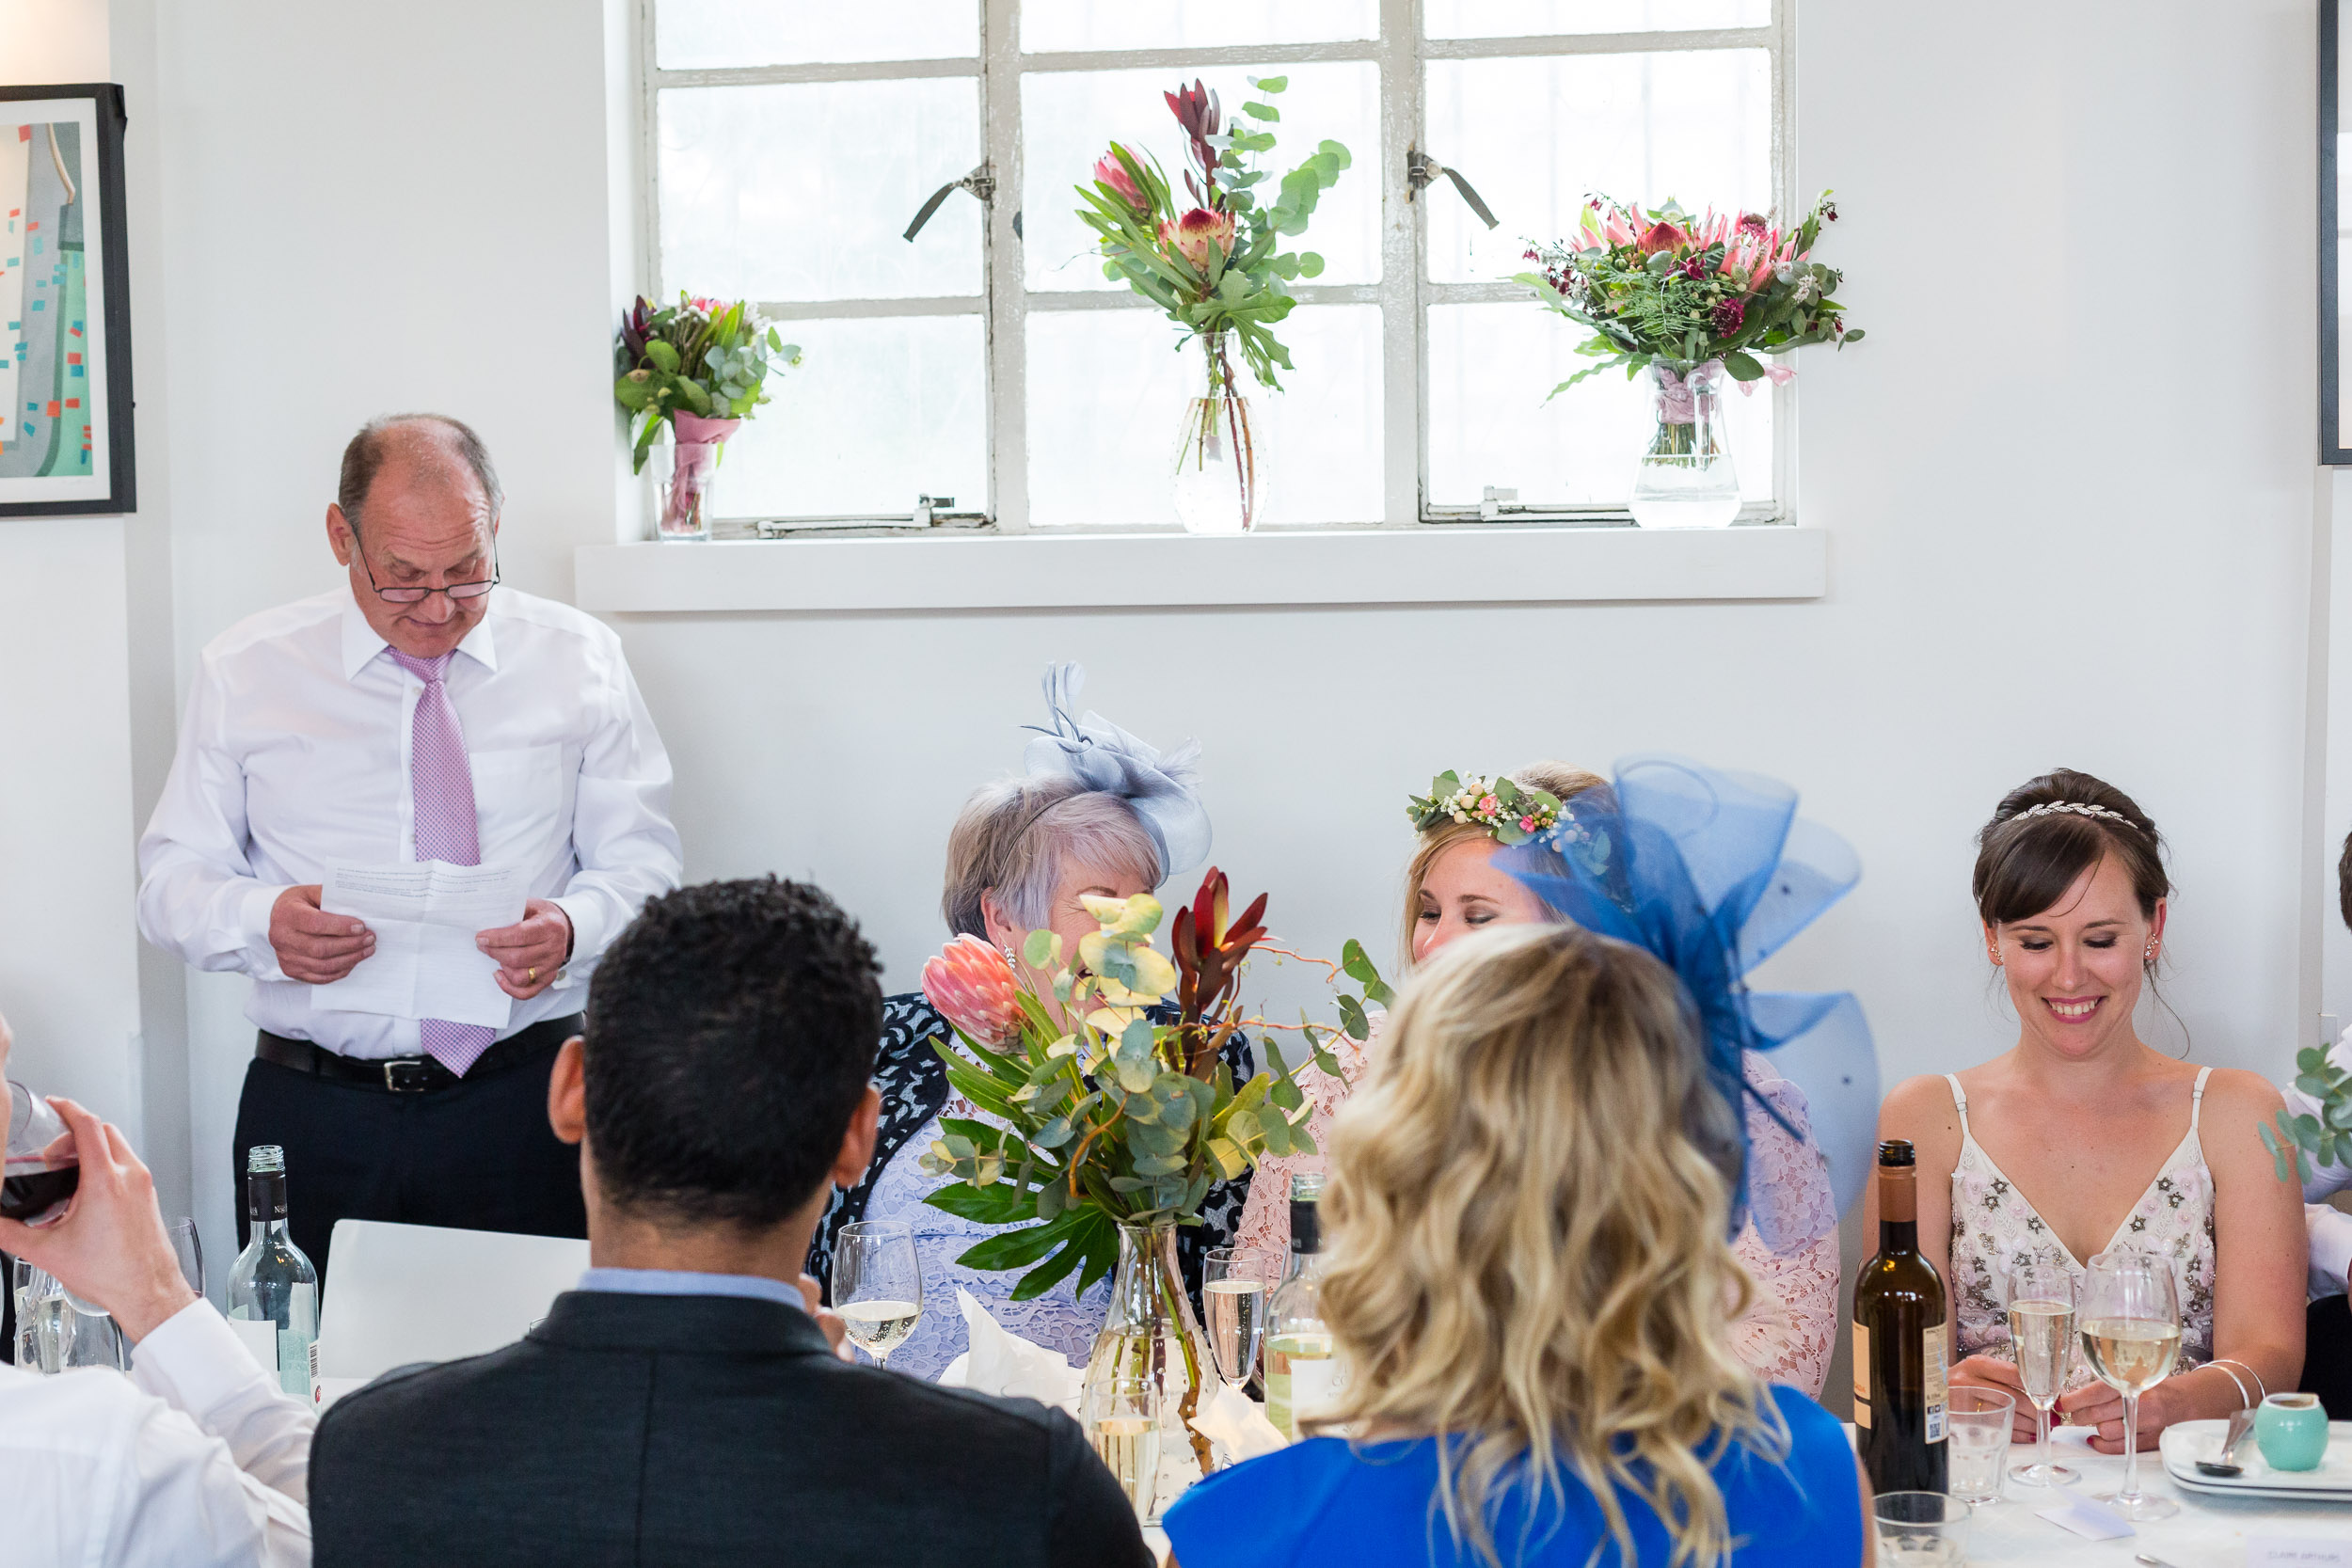 brockwell-lido-brixton-herne-hill-wedding-329.jpg